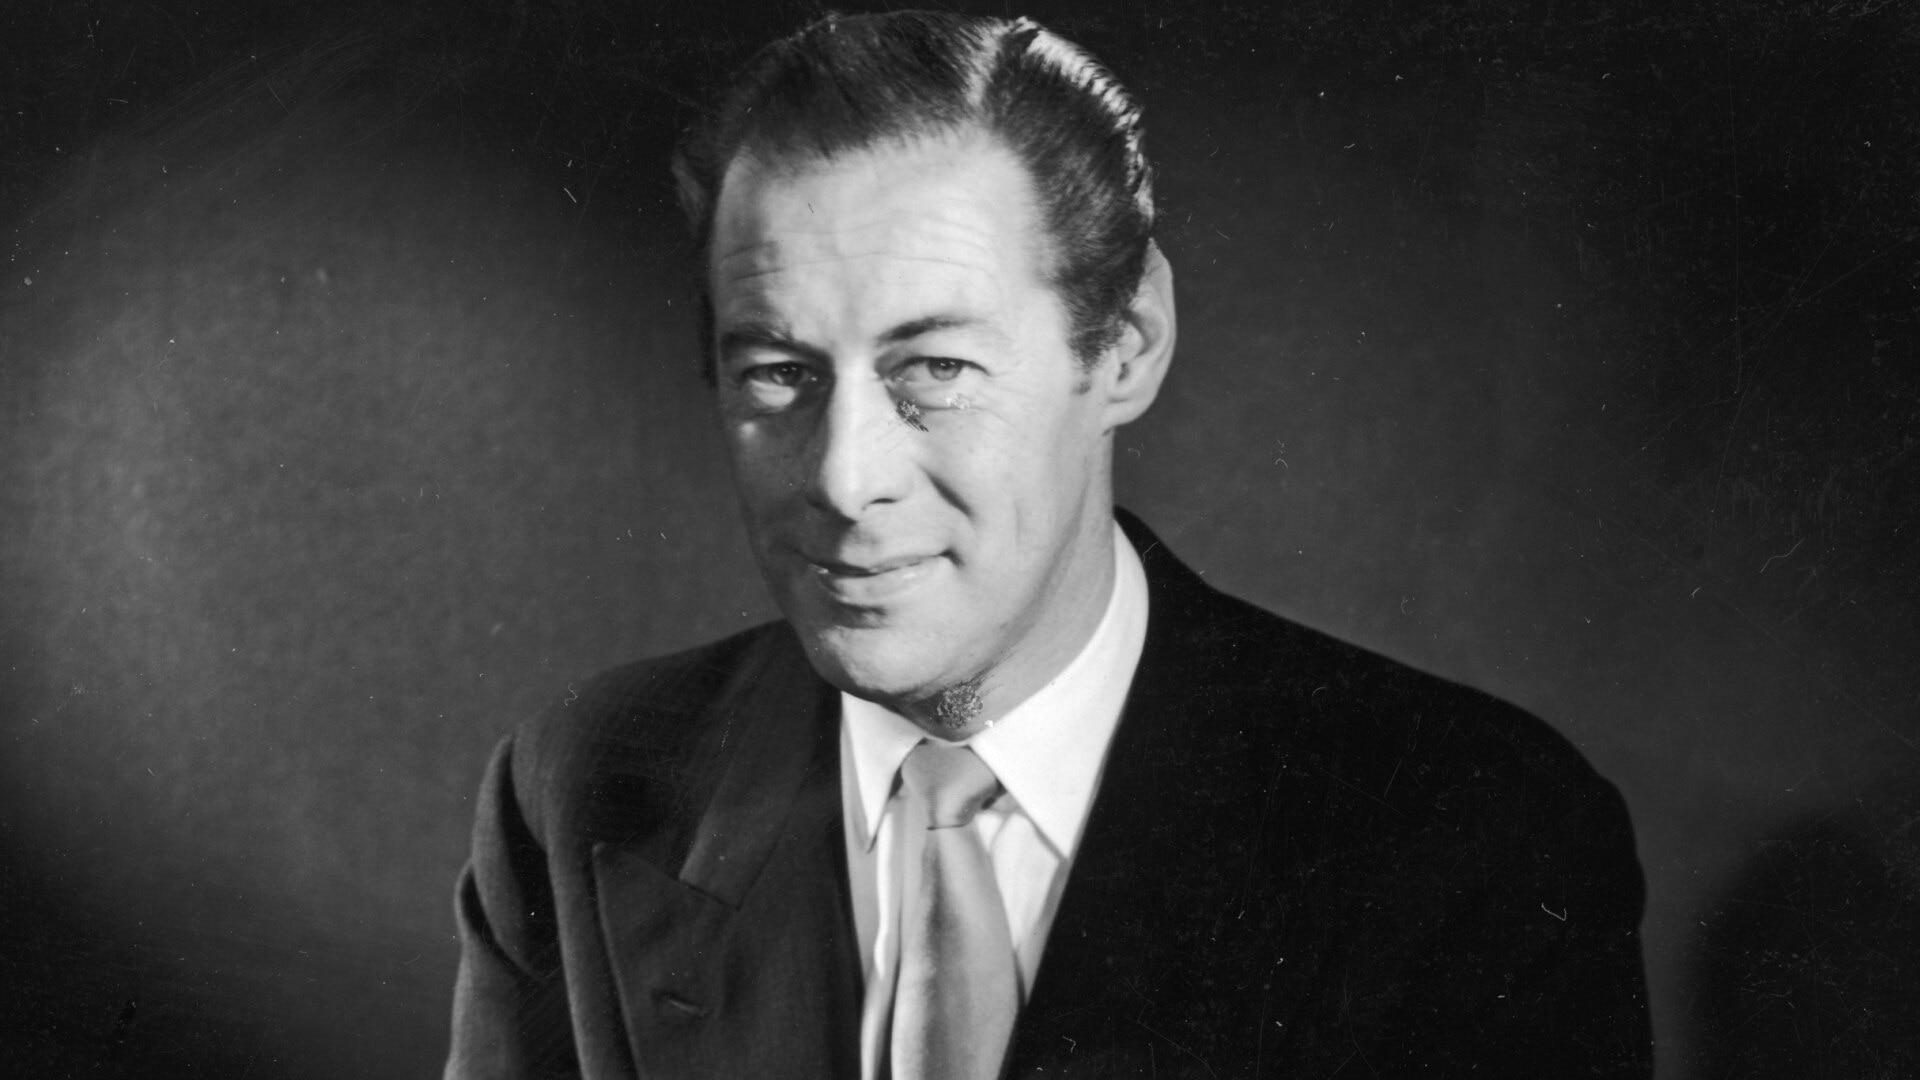 Discovering: Rex Harrison